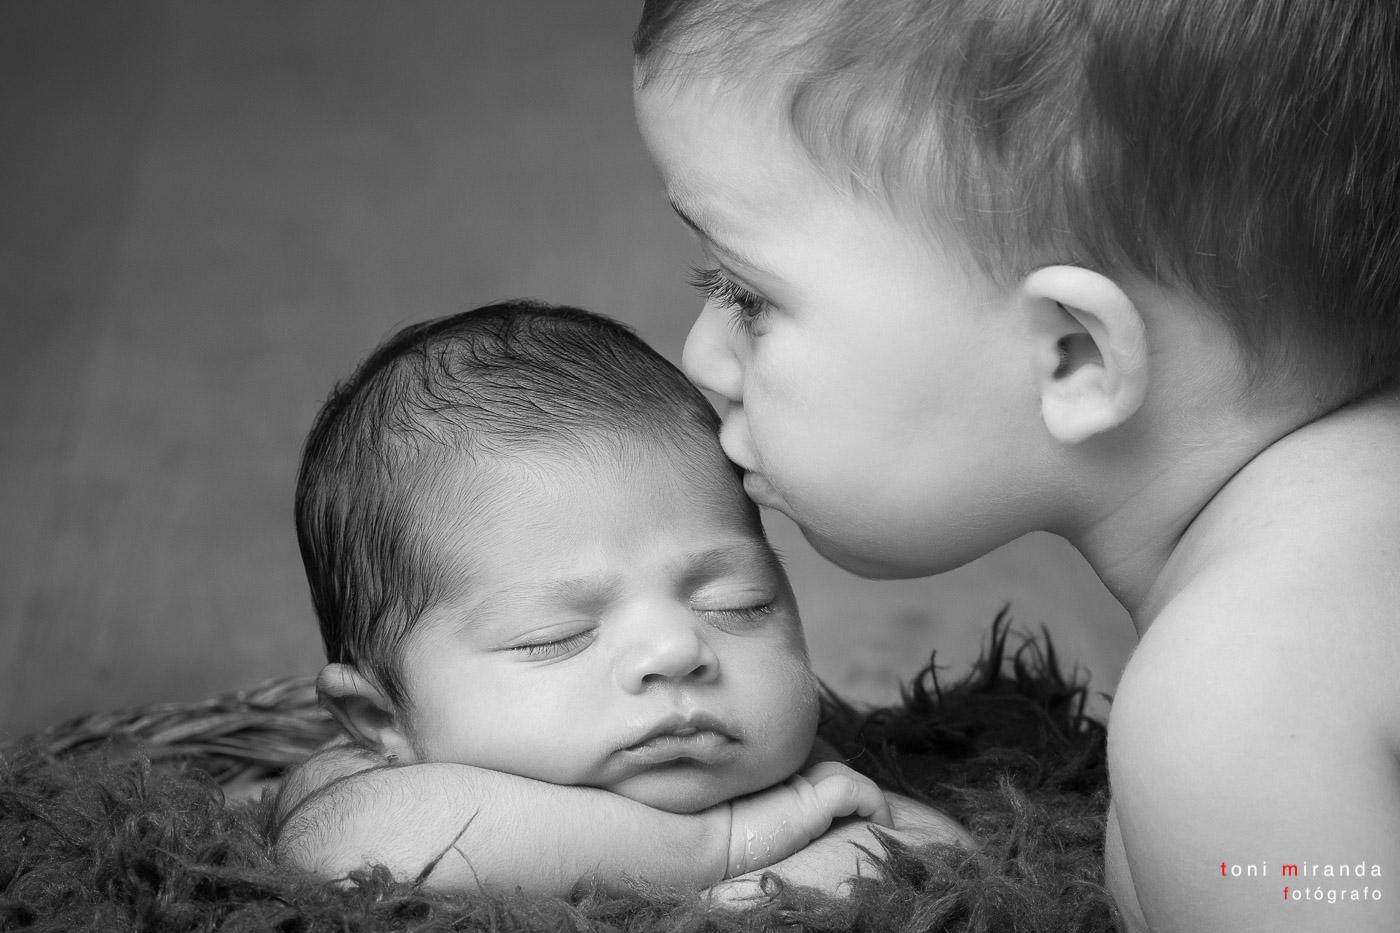 hermana besando a su hermana recien nacida